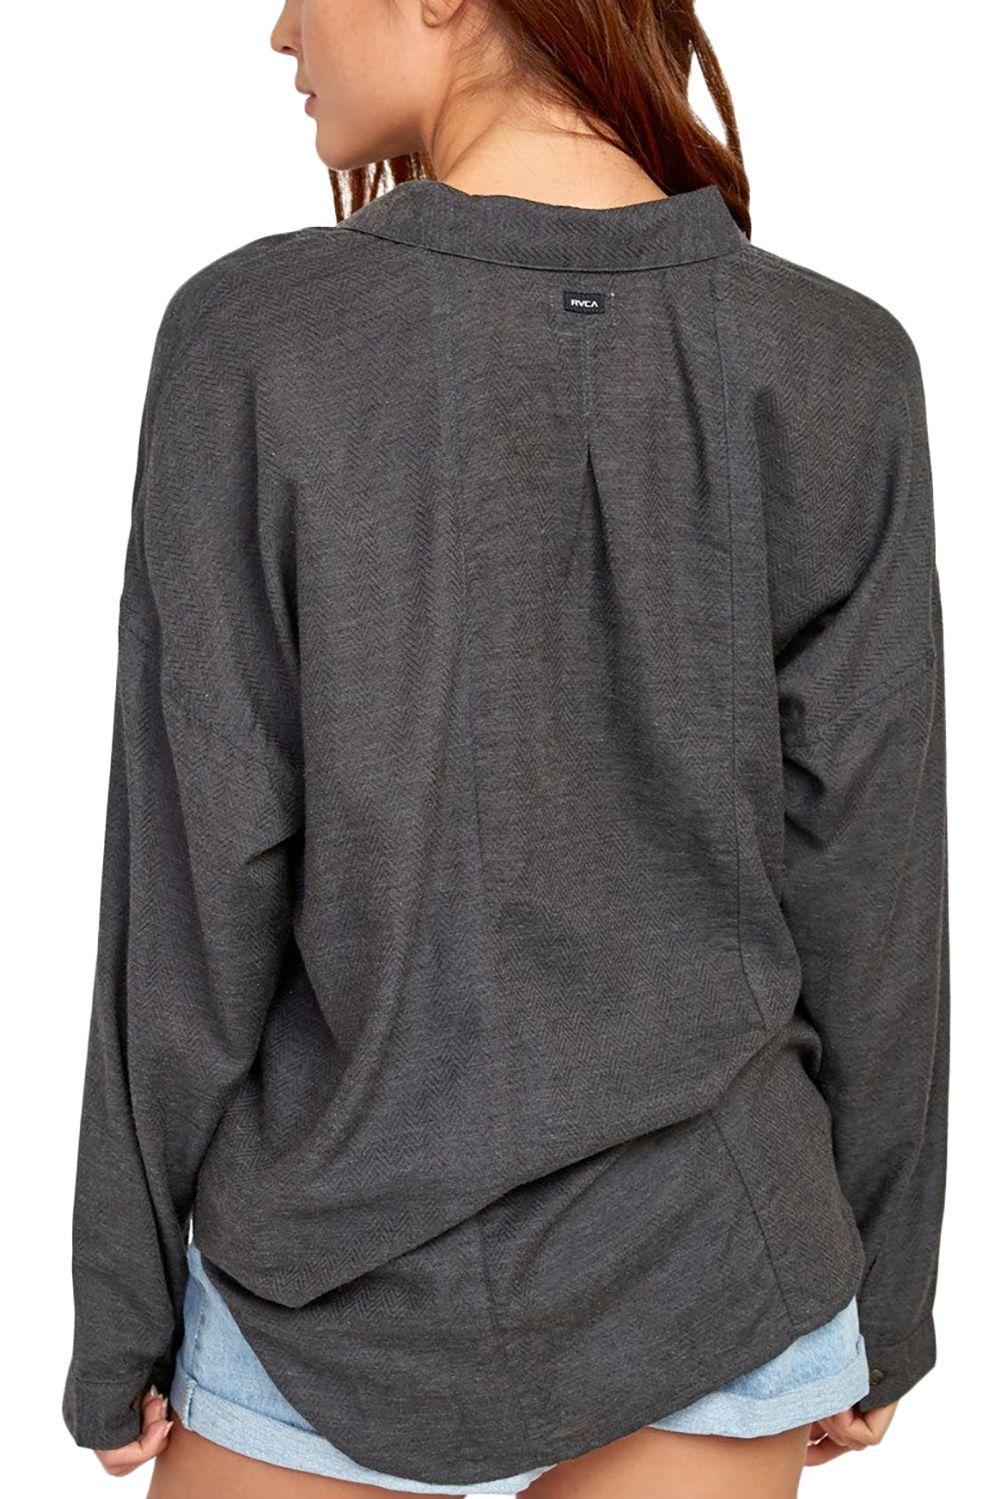 Camisa RVCA HABIT Black